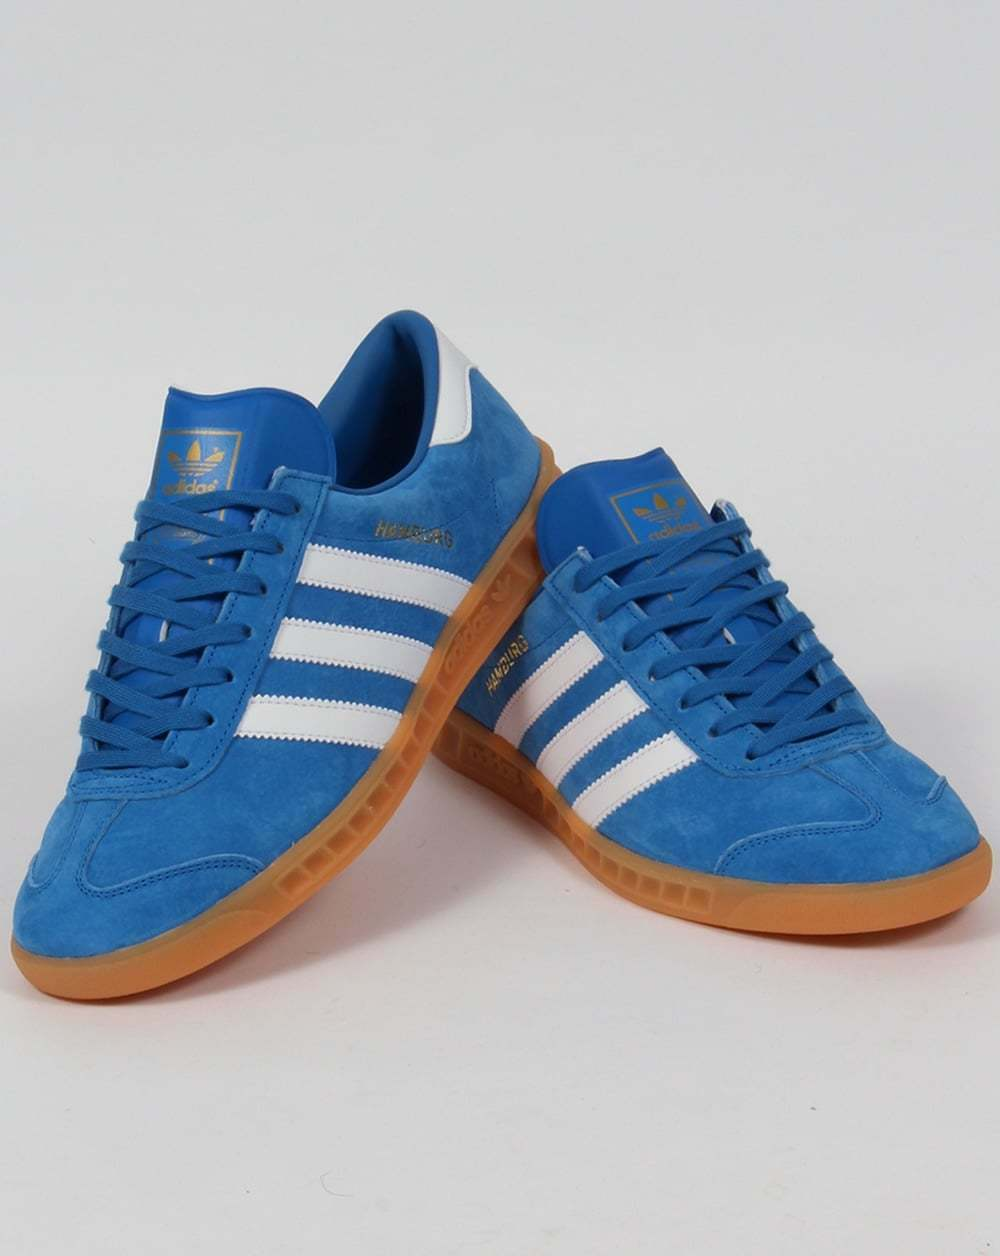 adidas Hamburg Trainers Trainers Trainers in Azulbird Azul & Blanco - suede gum sole retro classic a0e7a4